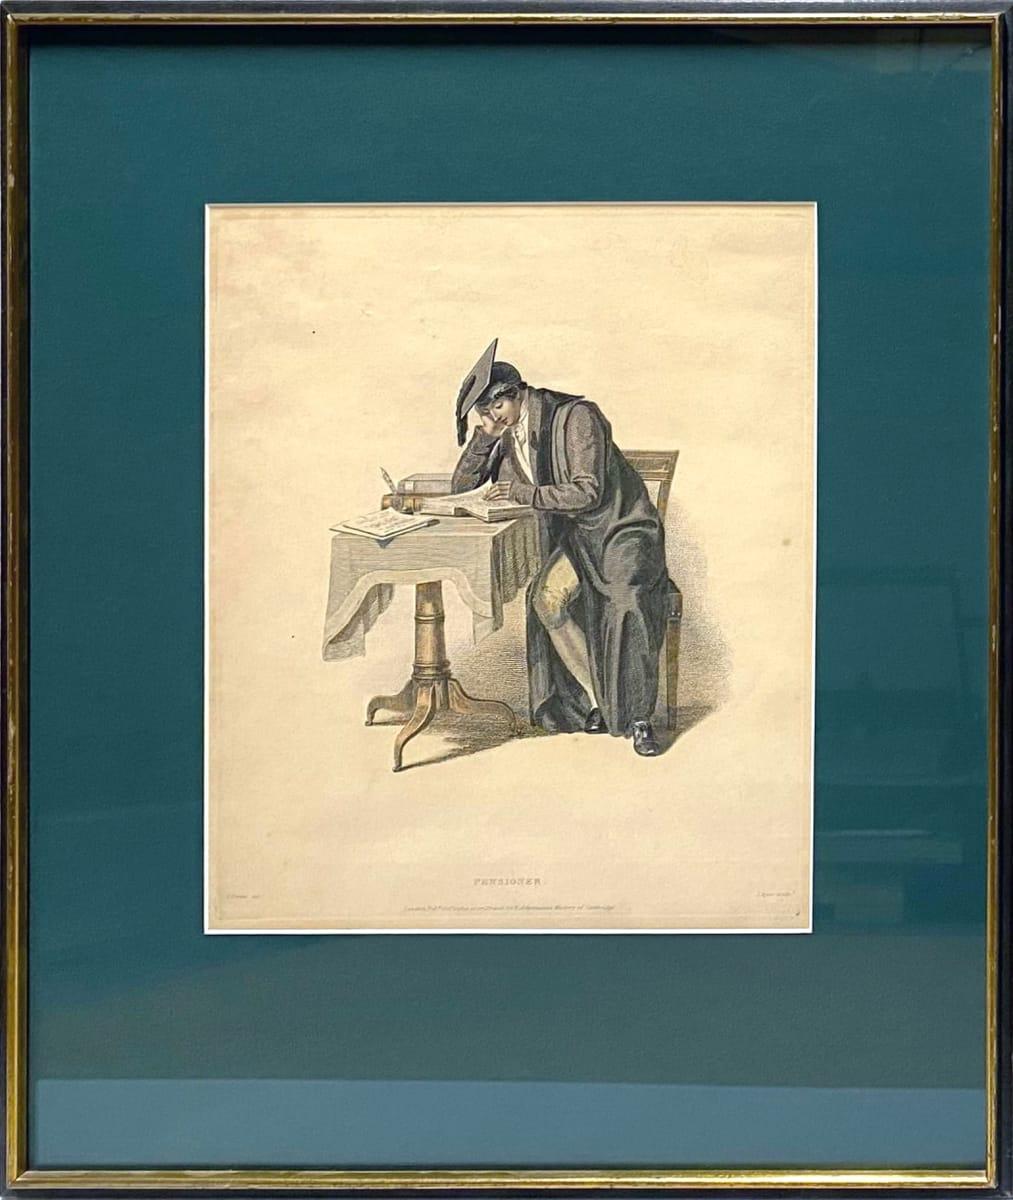 2769 - Pensioner by I. Uwins &  J. Agar